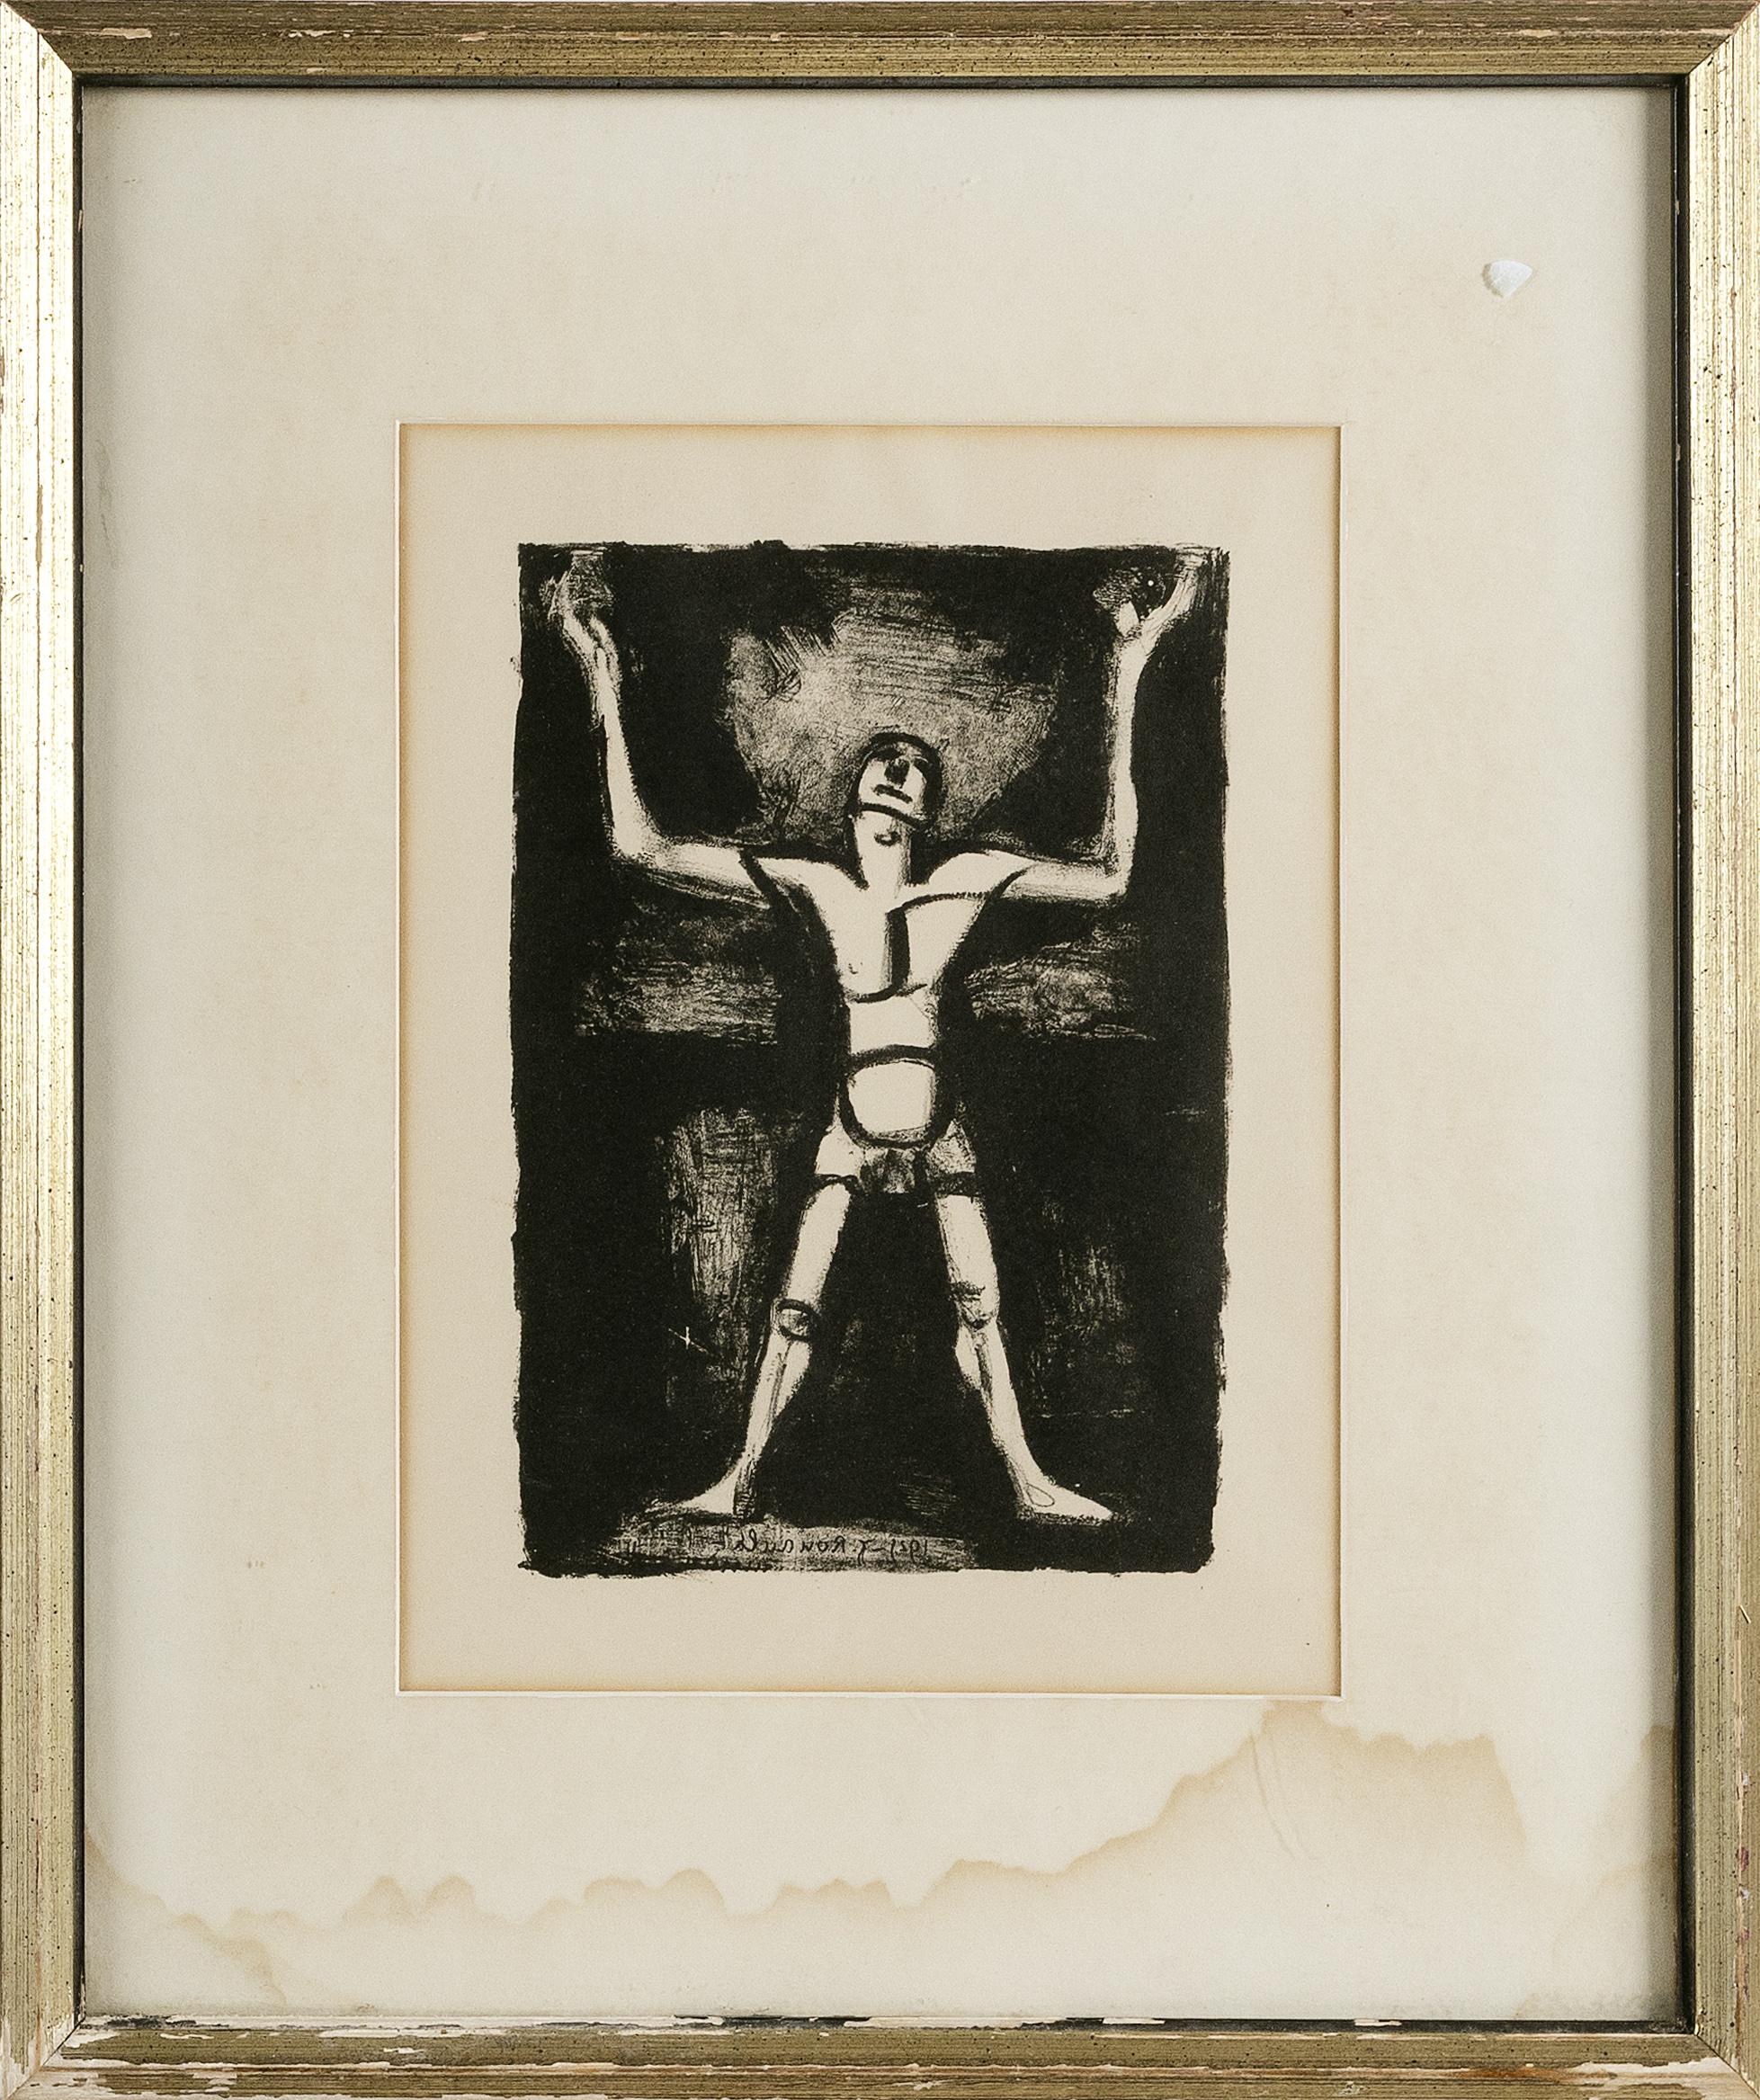 GEORGES ROUAULT (France, 1871-1958), Le Jongleur, Lithograph on paper, 11.25